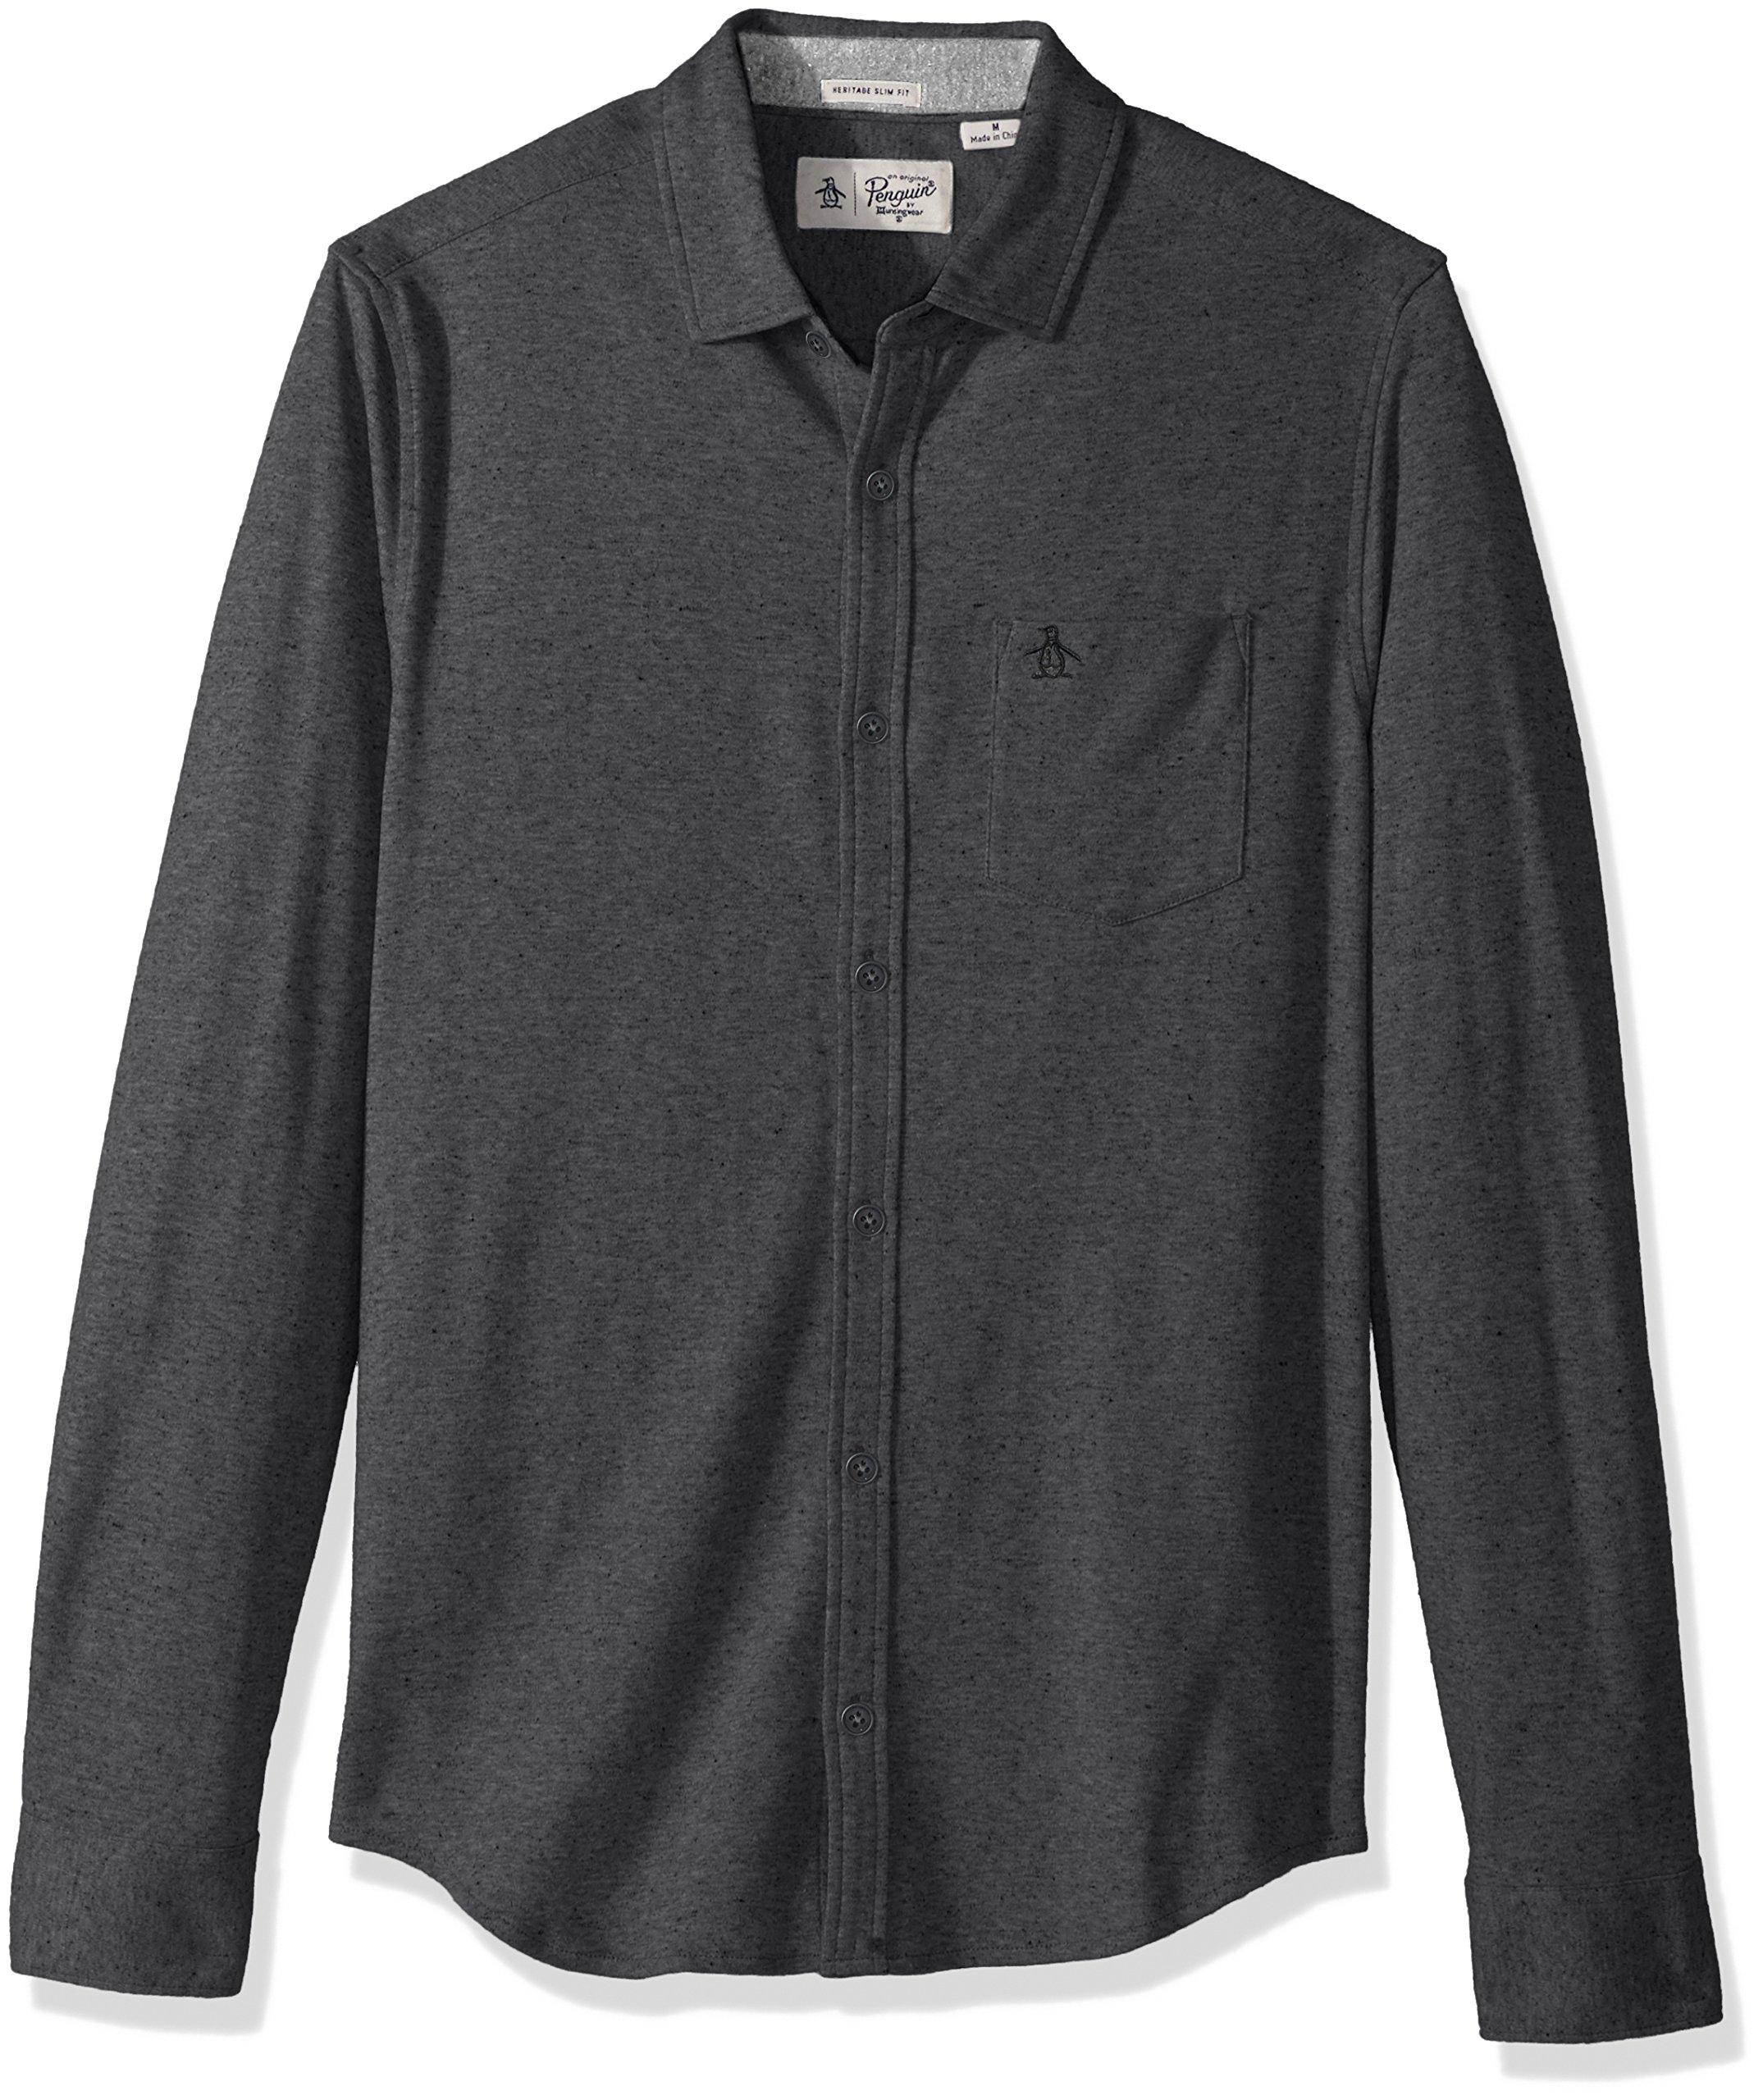 Original Penguin Men's NEP Speck Shirt, Dark Charcoal Heather, Extra Large